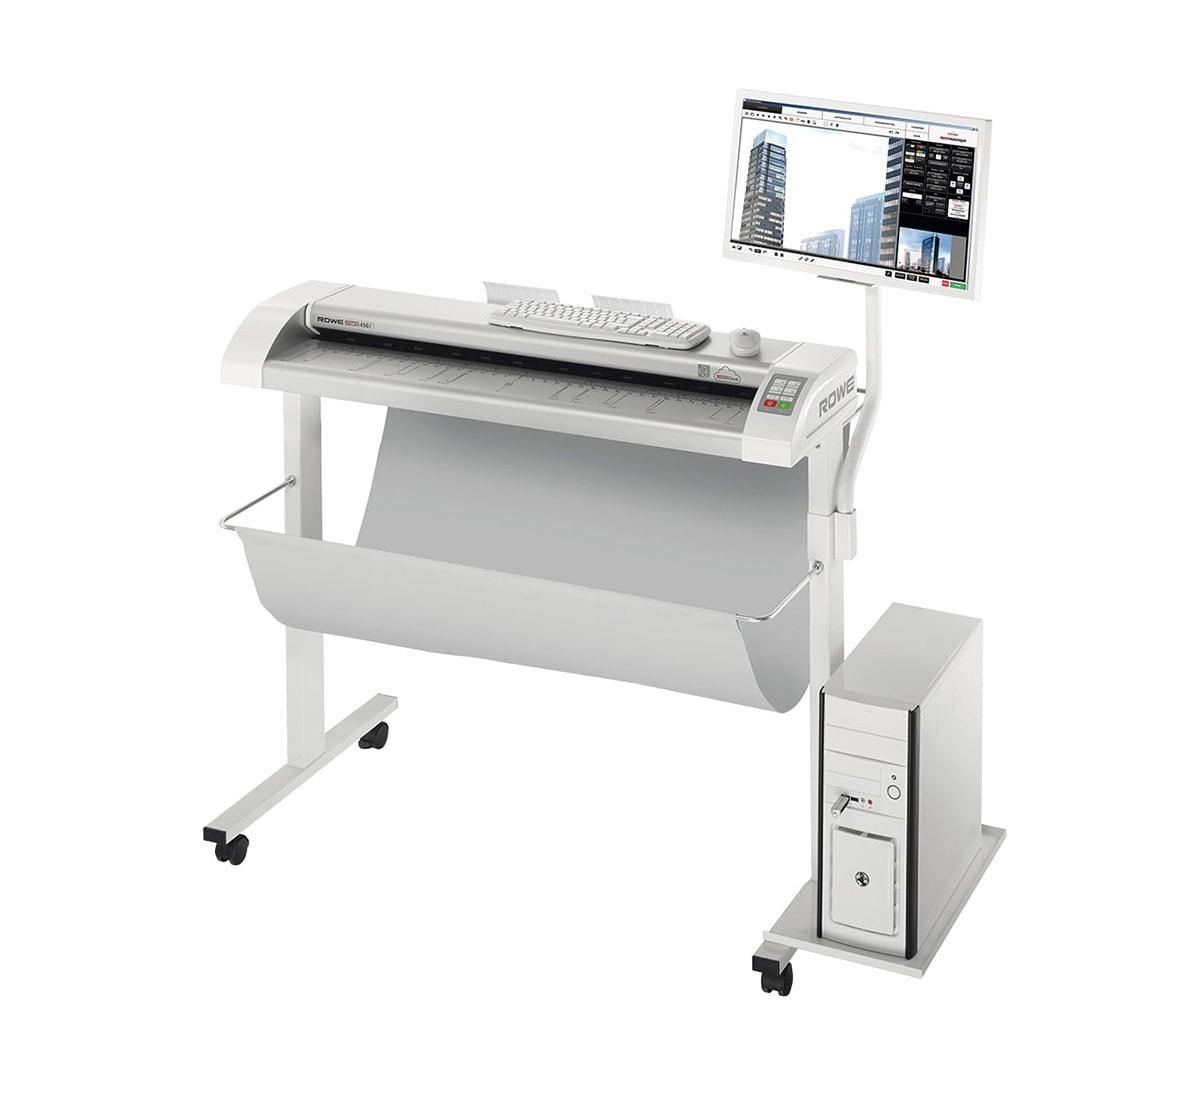 velikoformatni skener A0